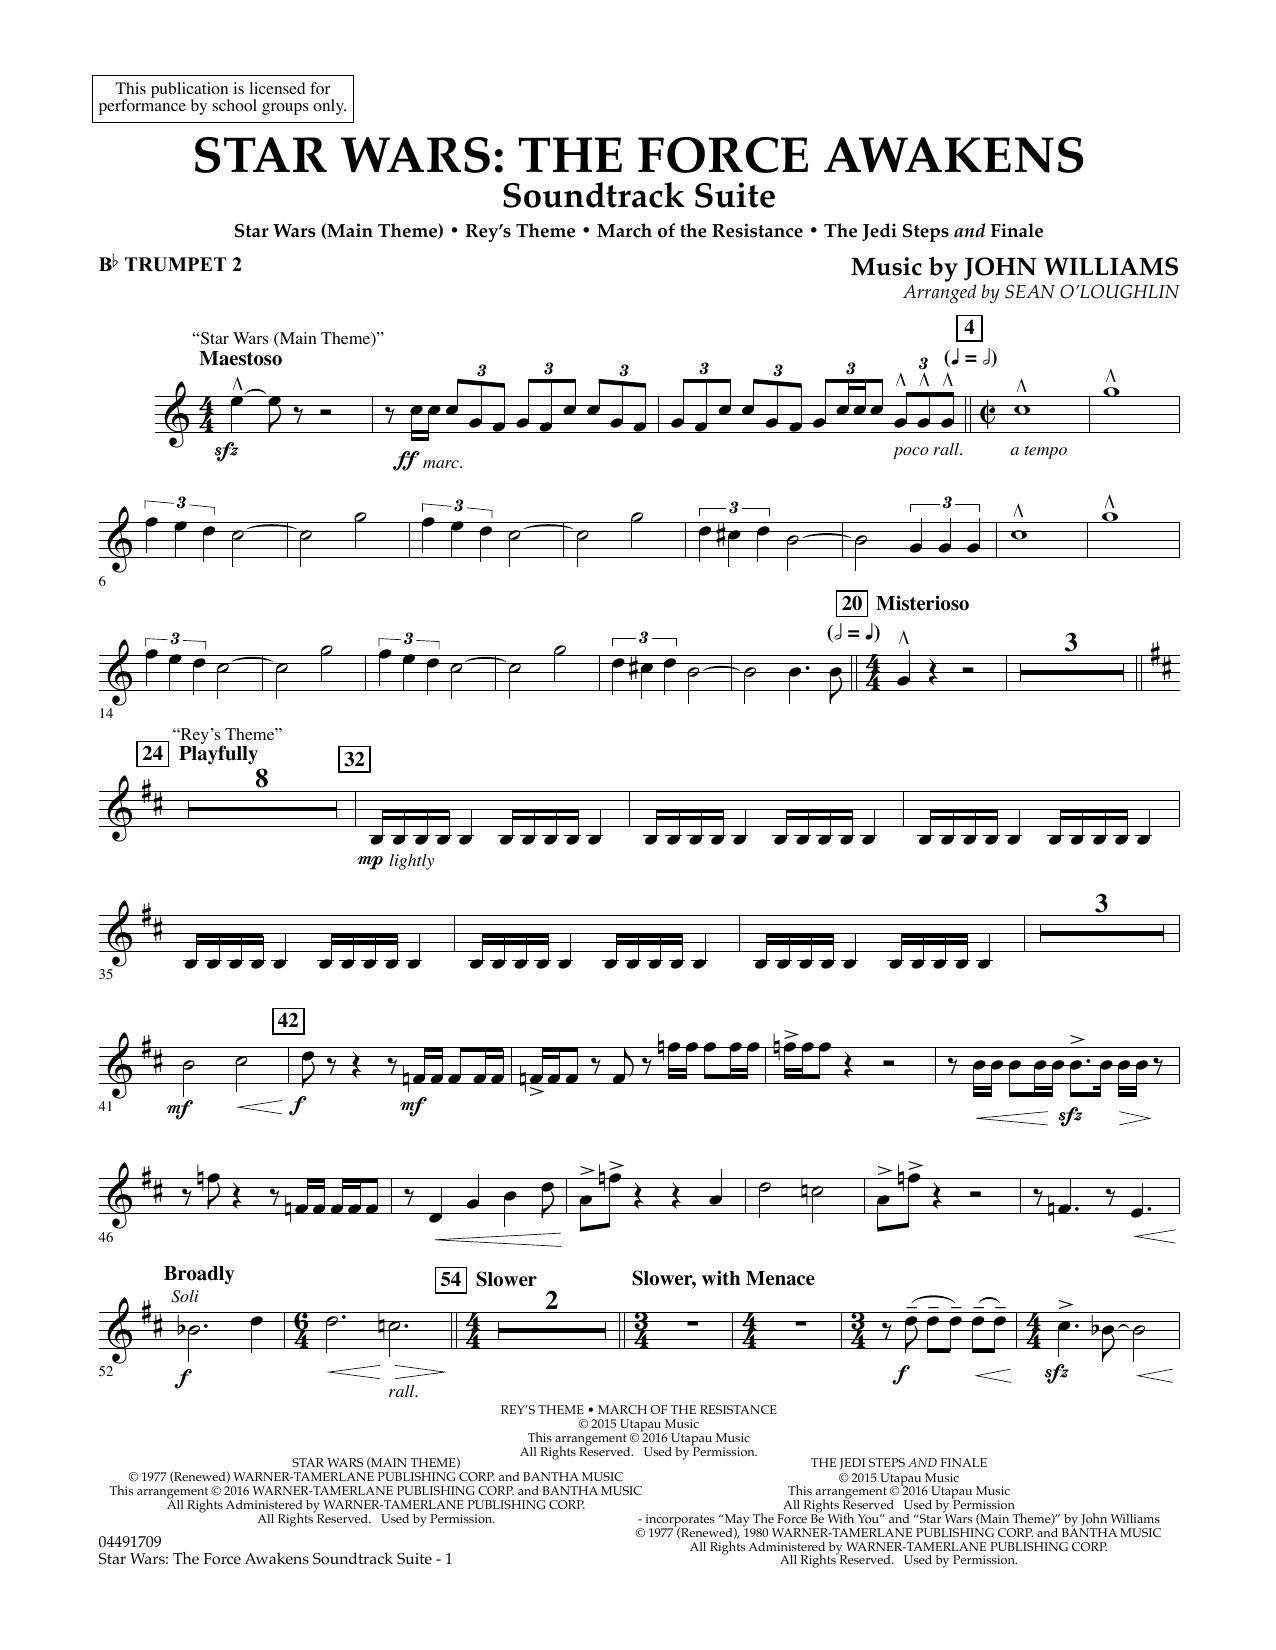 John Williams - Star Wars: The Force Awakens Soundtrack Suite - Bb Trumpet 2